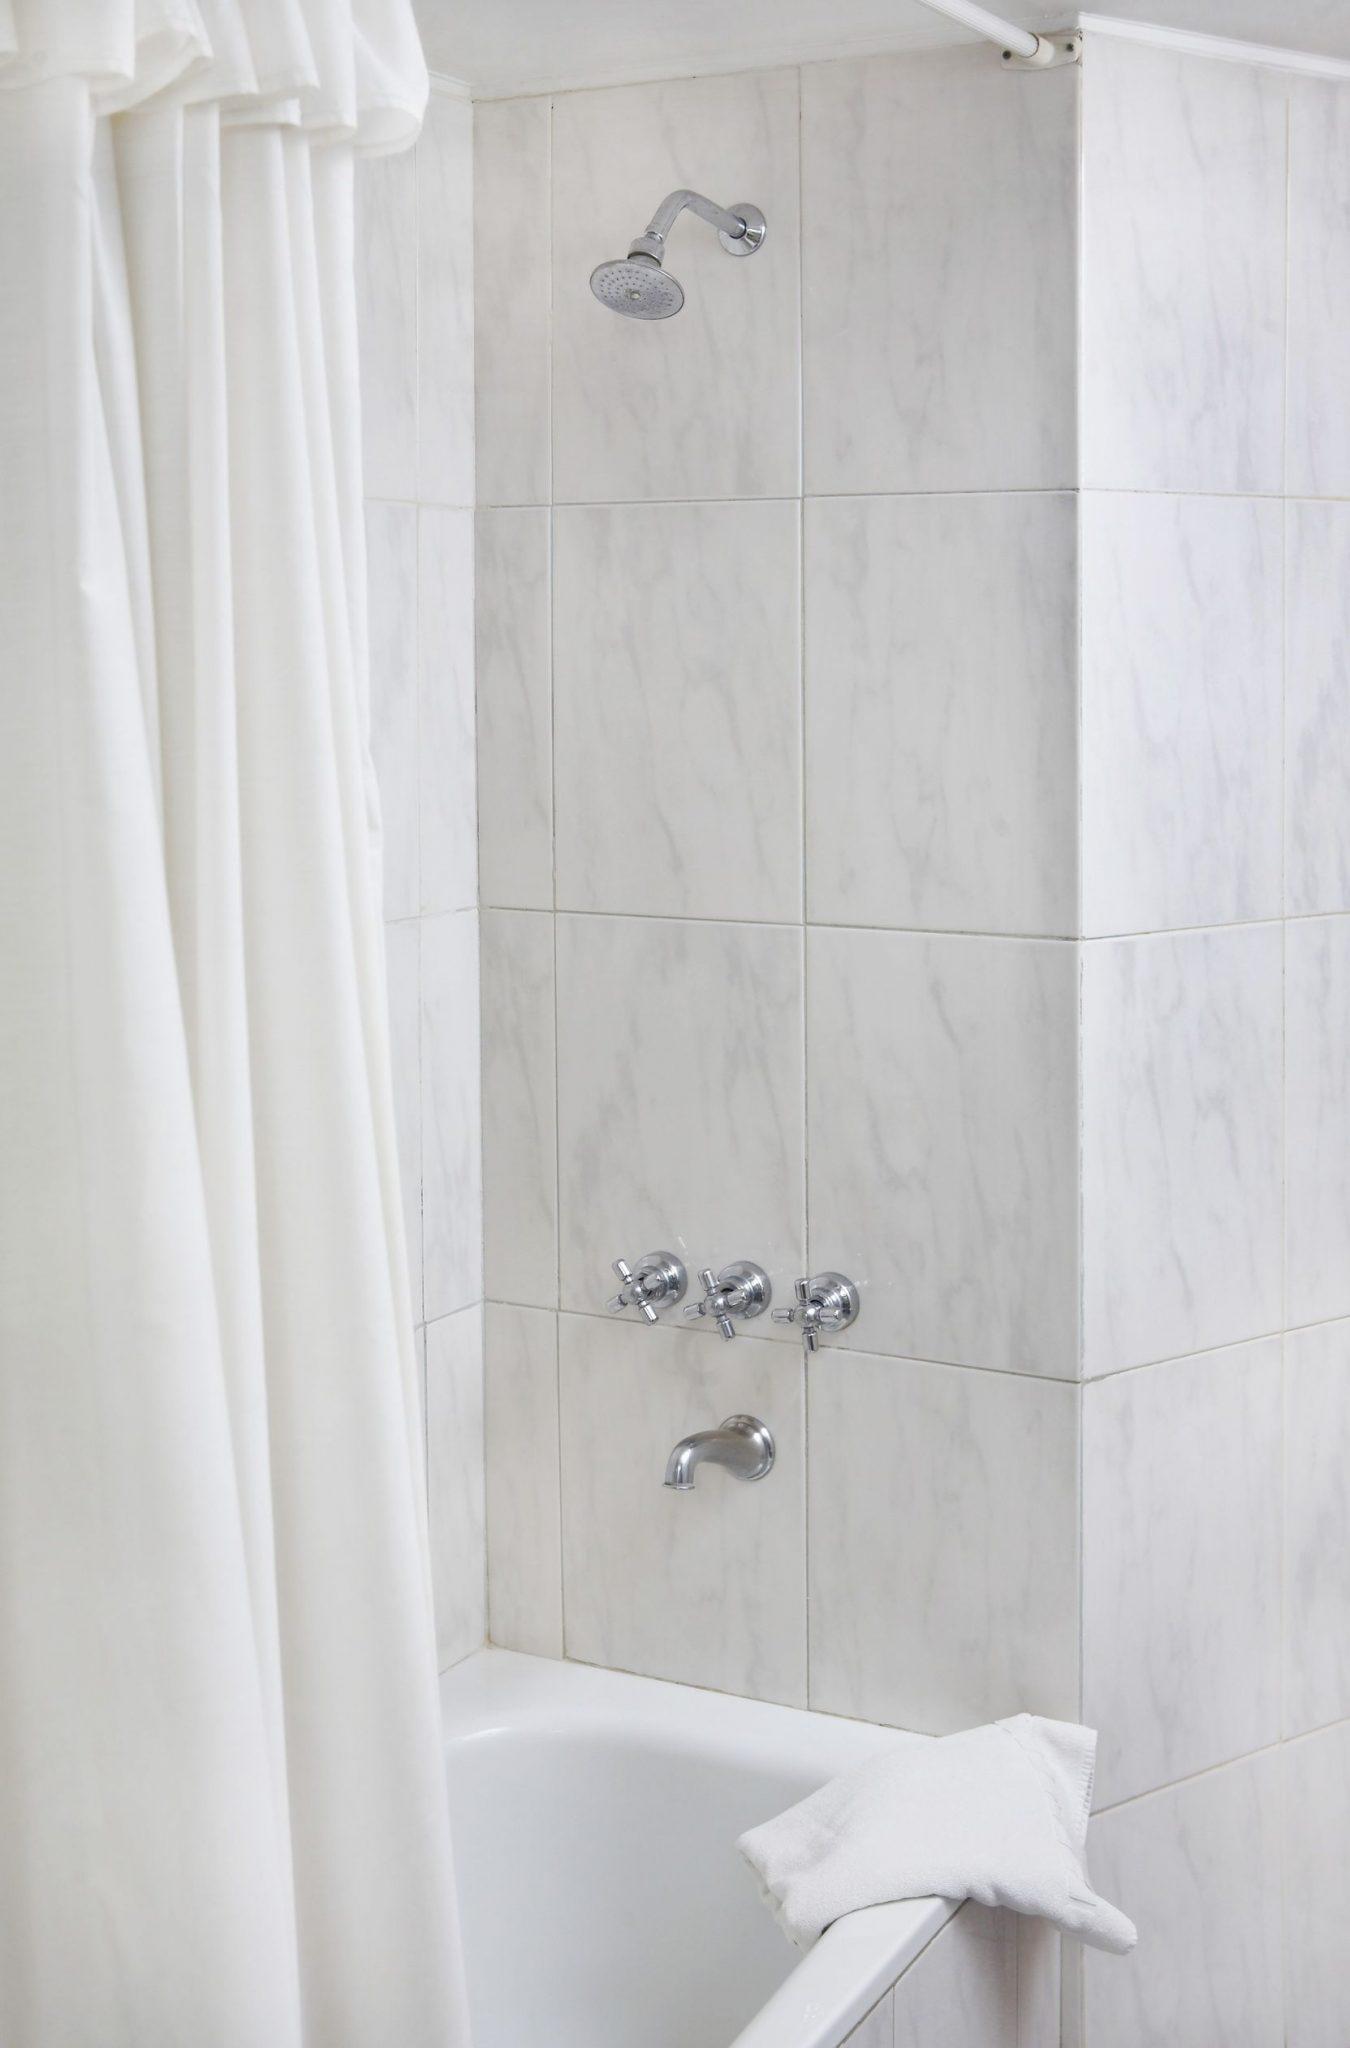 Bathtub Liners Archives - Luxury Bathroom Remodeling - One Day Bath ...